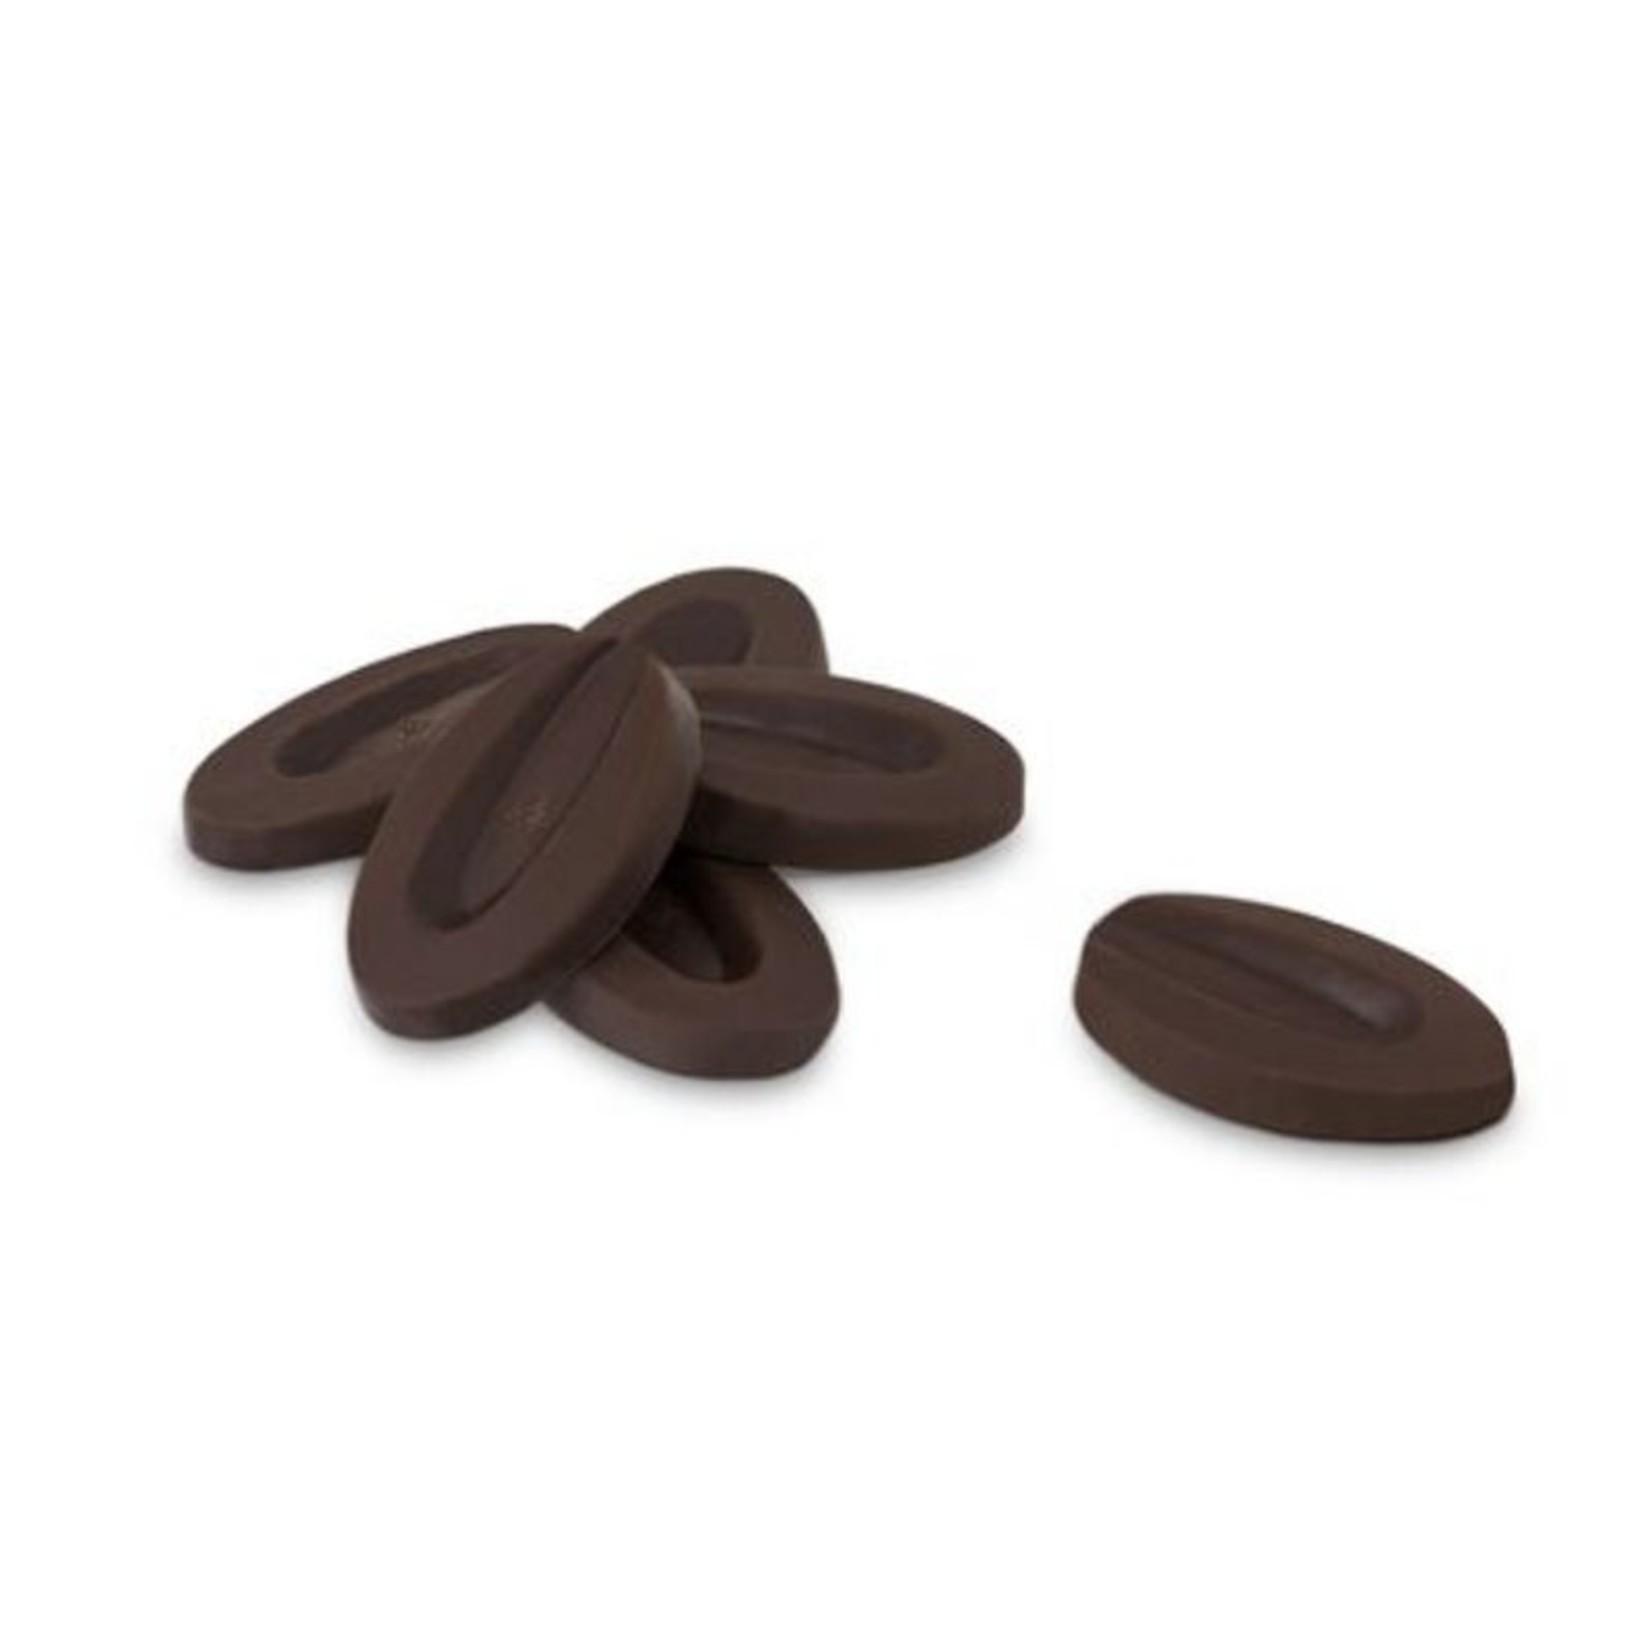 Valrhona Valrhona - Araguani Dark Chocolate 72% - 1 lb, 4656-R